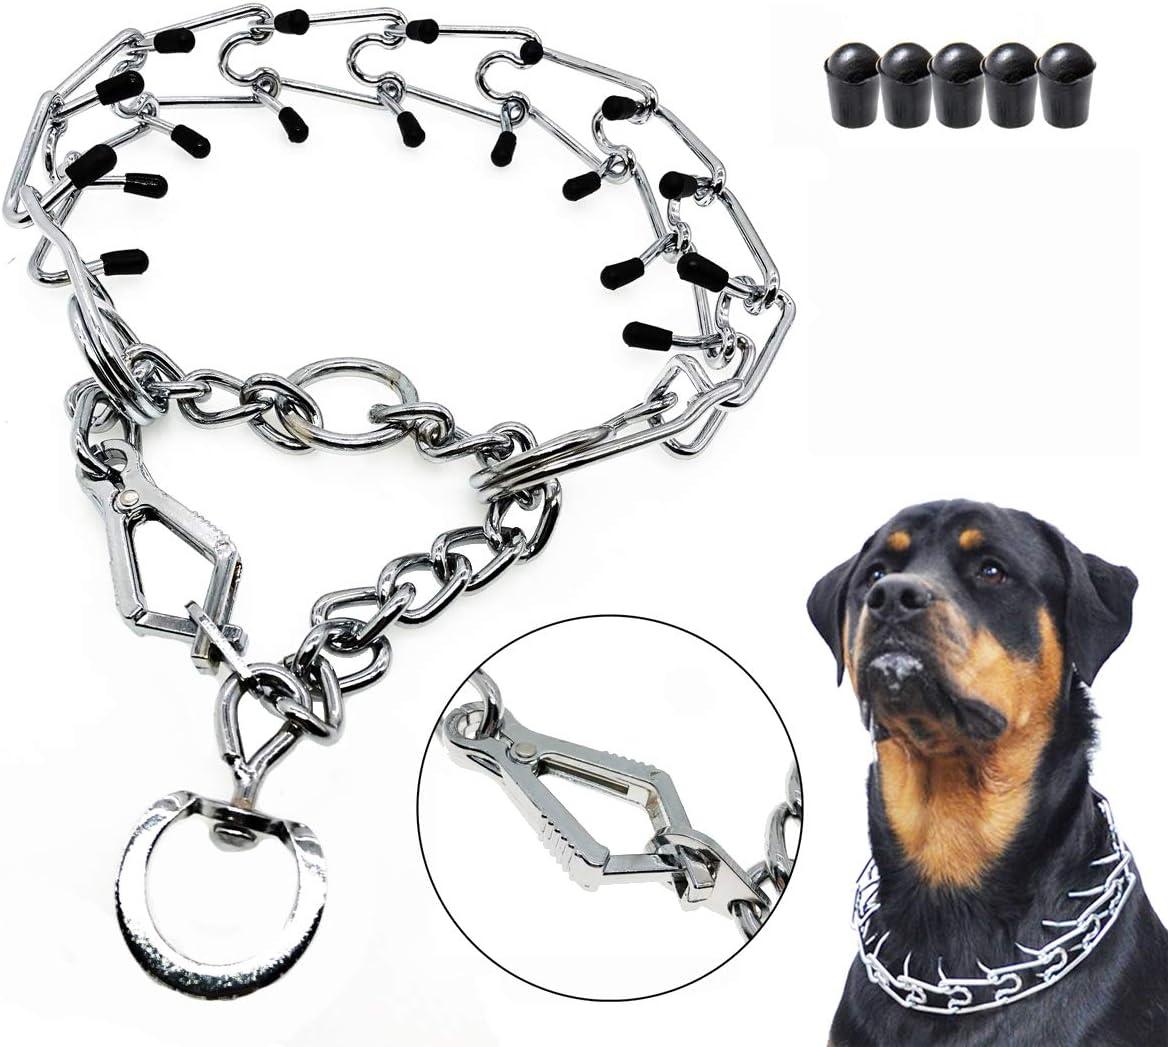 Stainless Steel Choke Pinch Dog Collar with Comfort Tips Mayerzon Dog Prong Training Collar Fish-Hook Collar